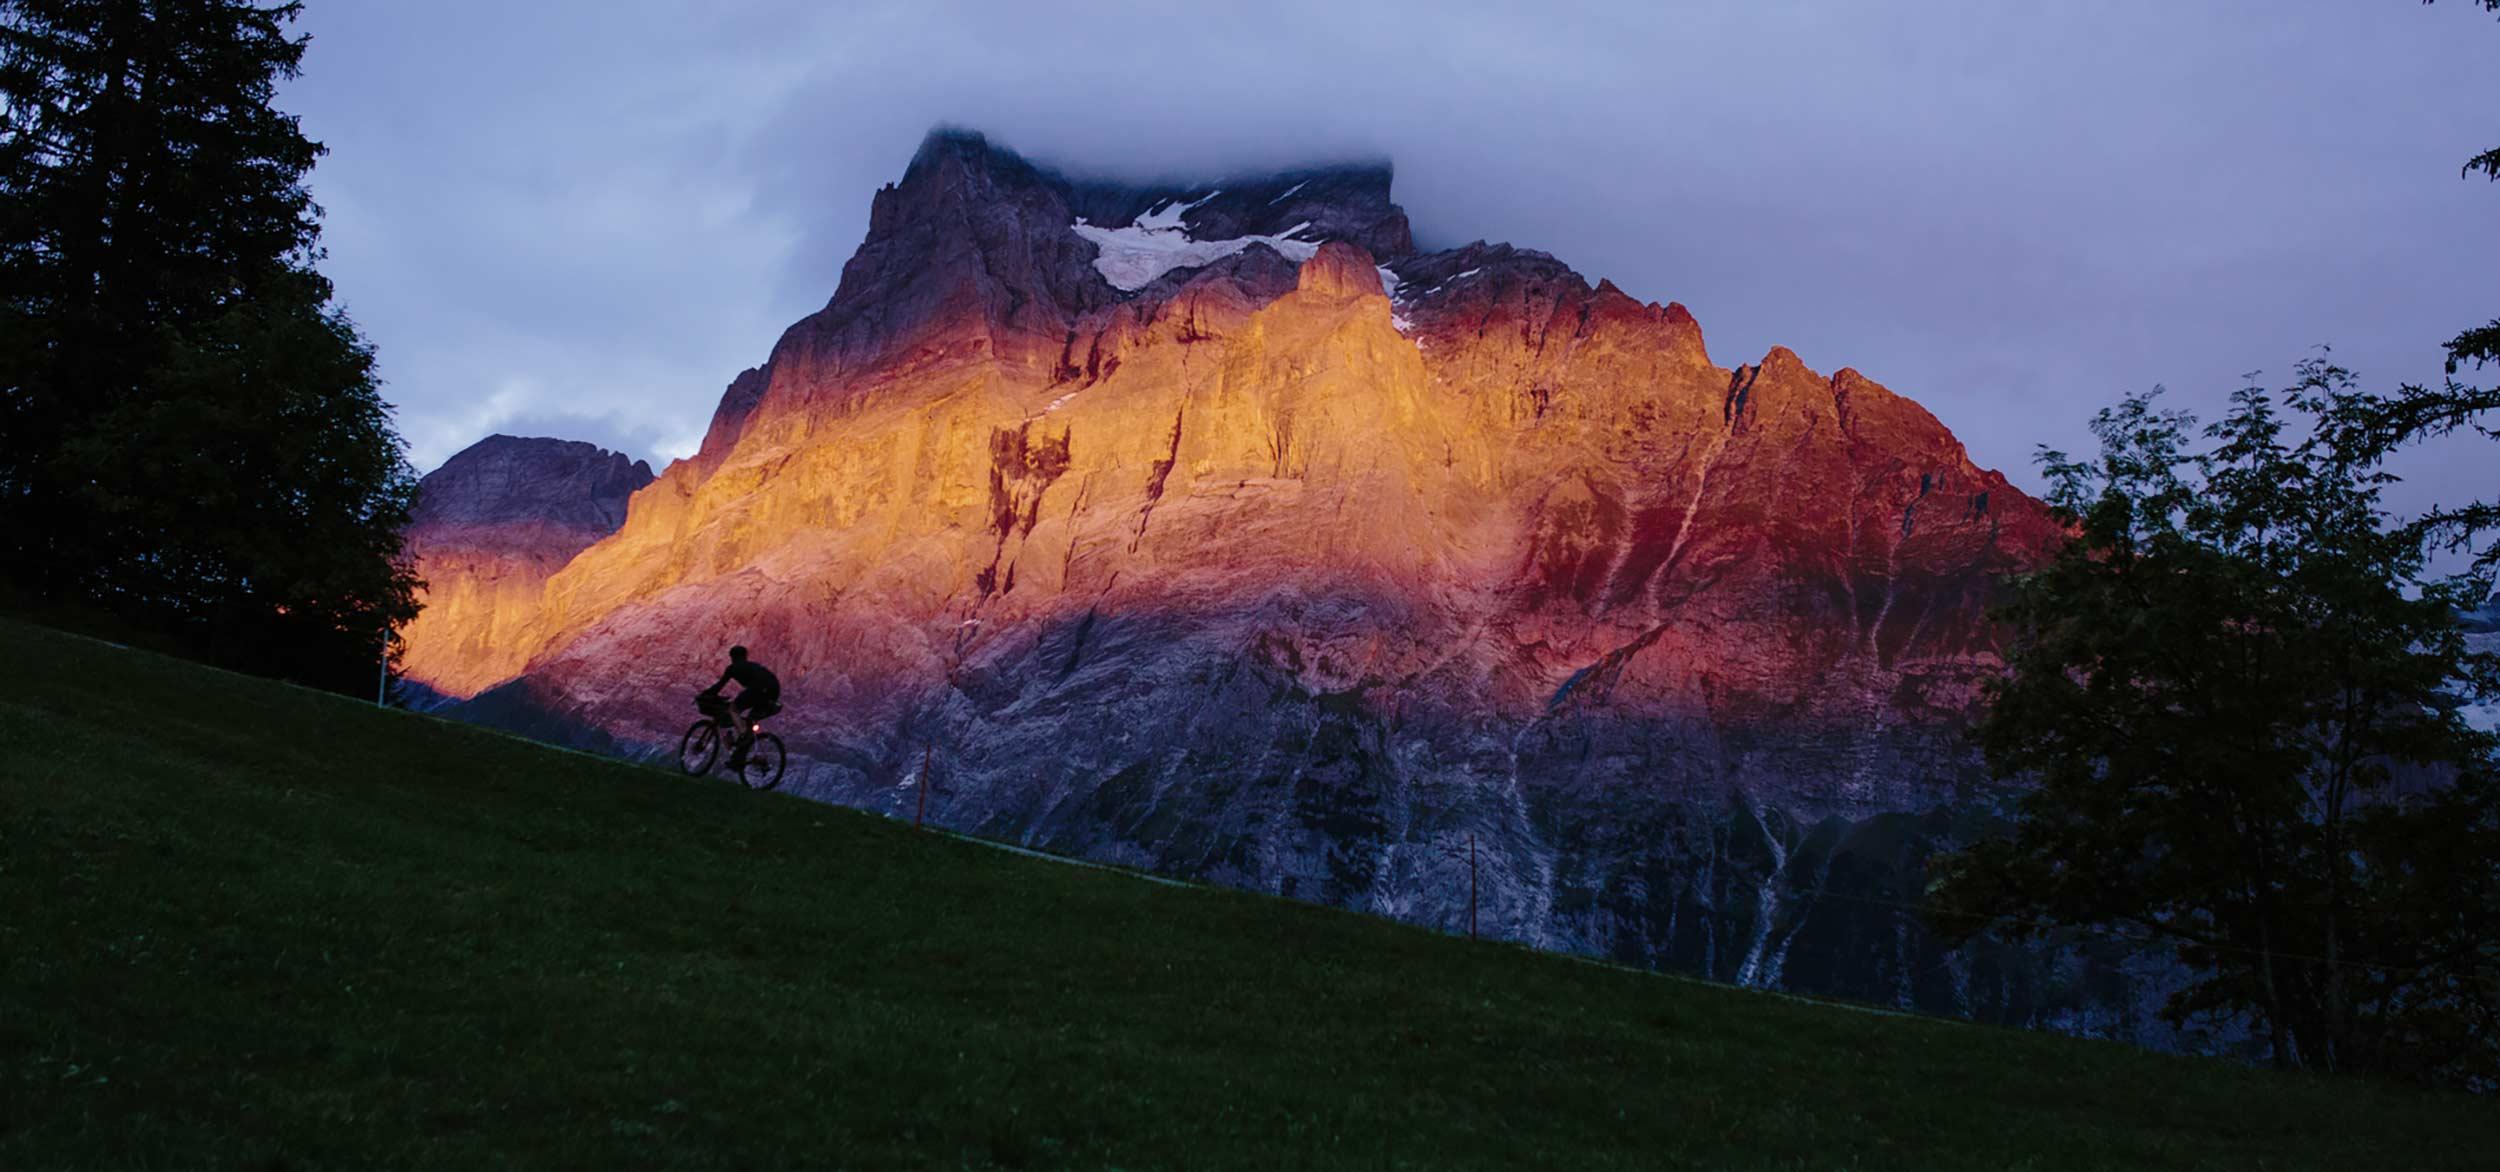 jamesrobertson-noise-free-apidura-bikepacking.jpg